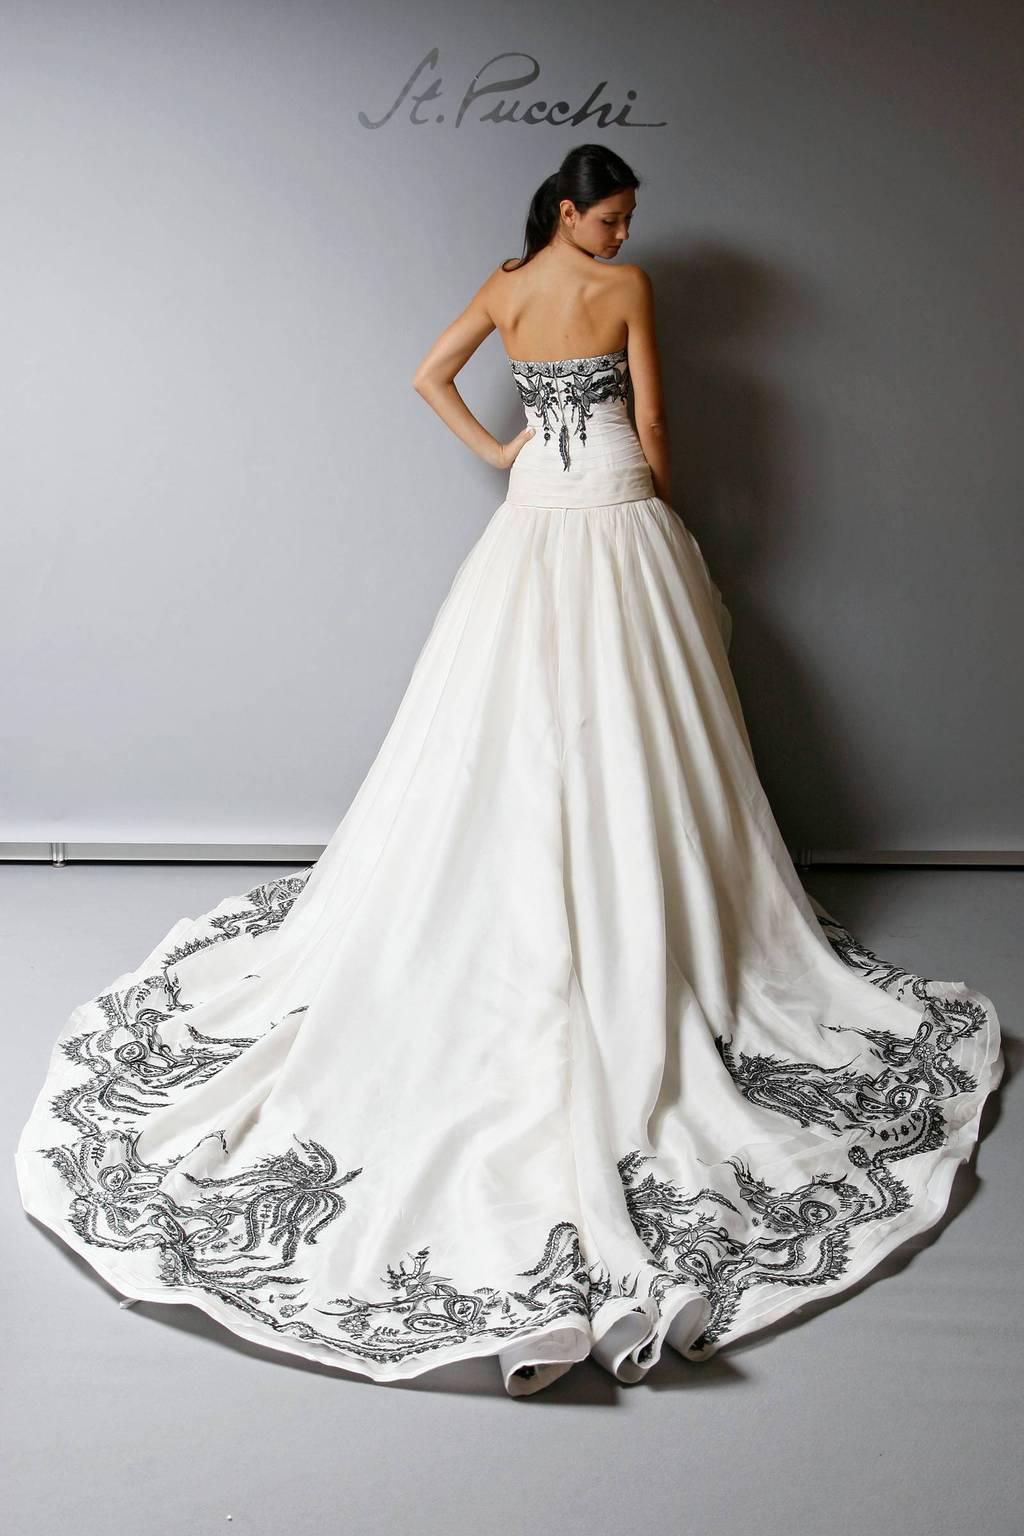 2013 Wedding Dress St Pucchi Bridal cream with black